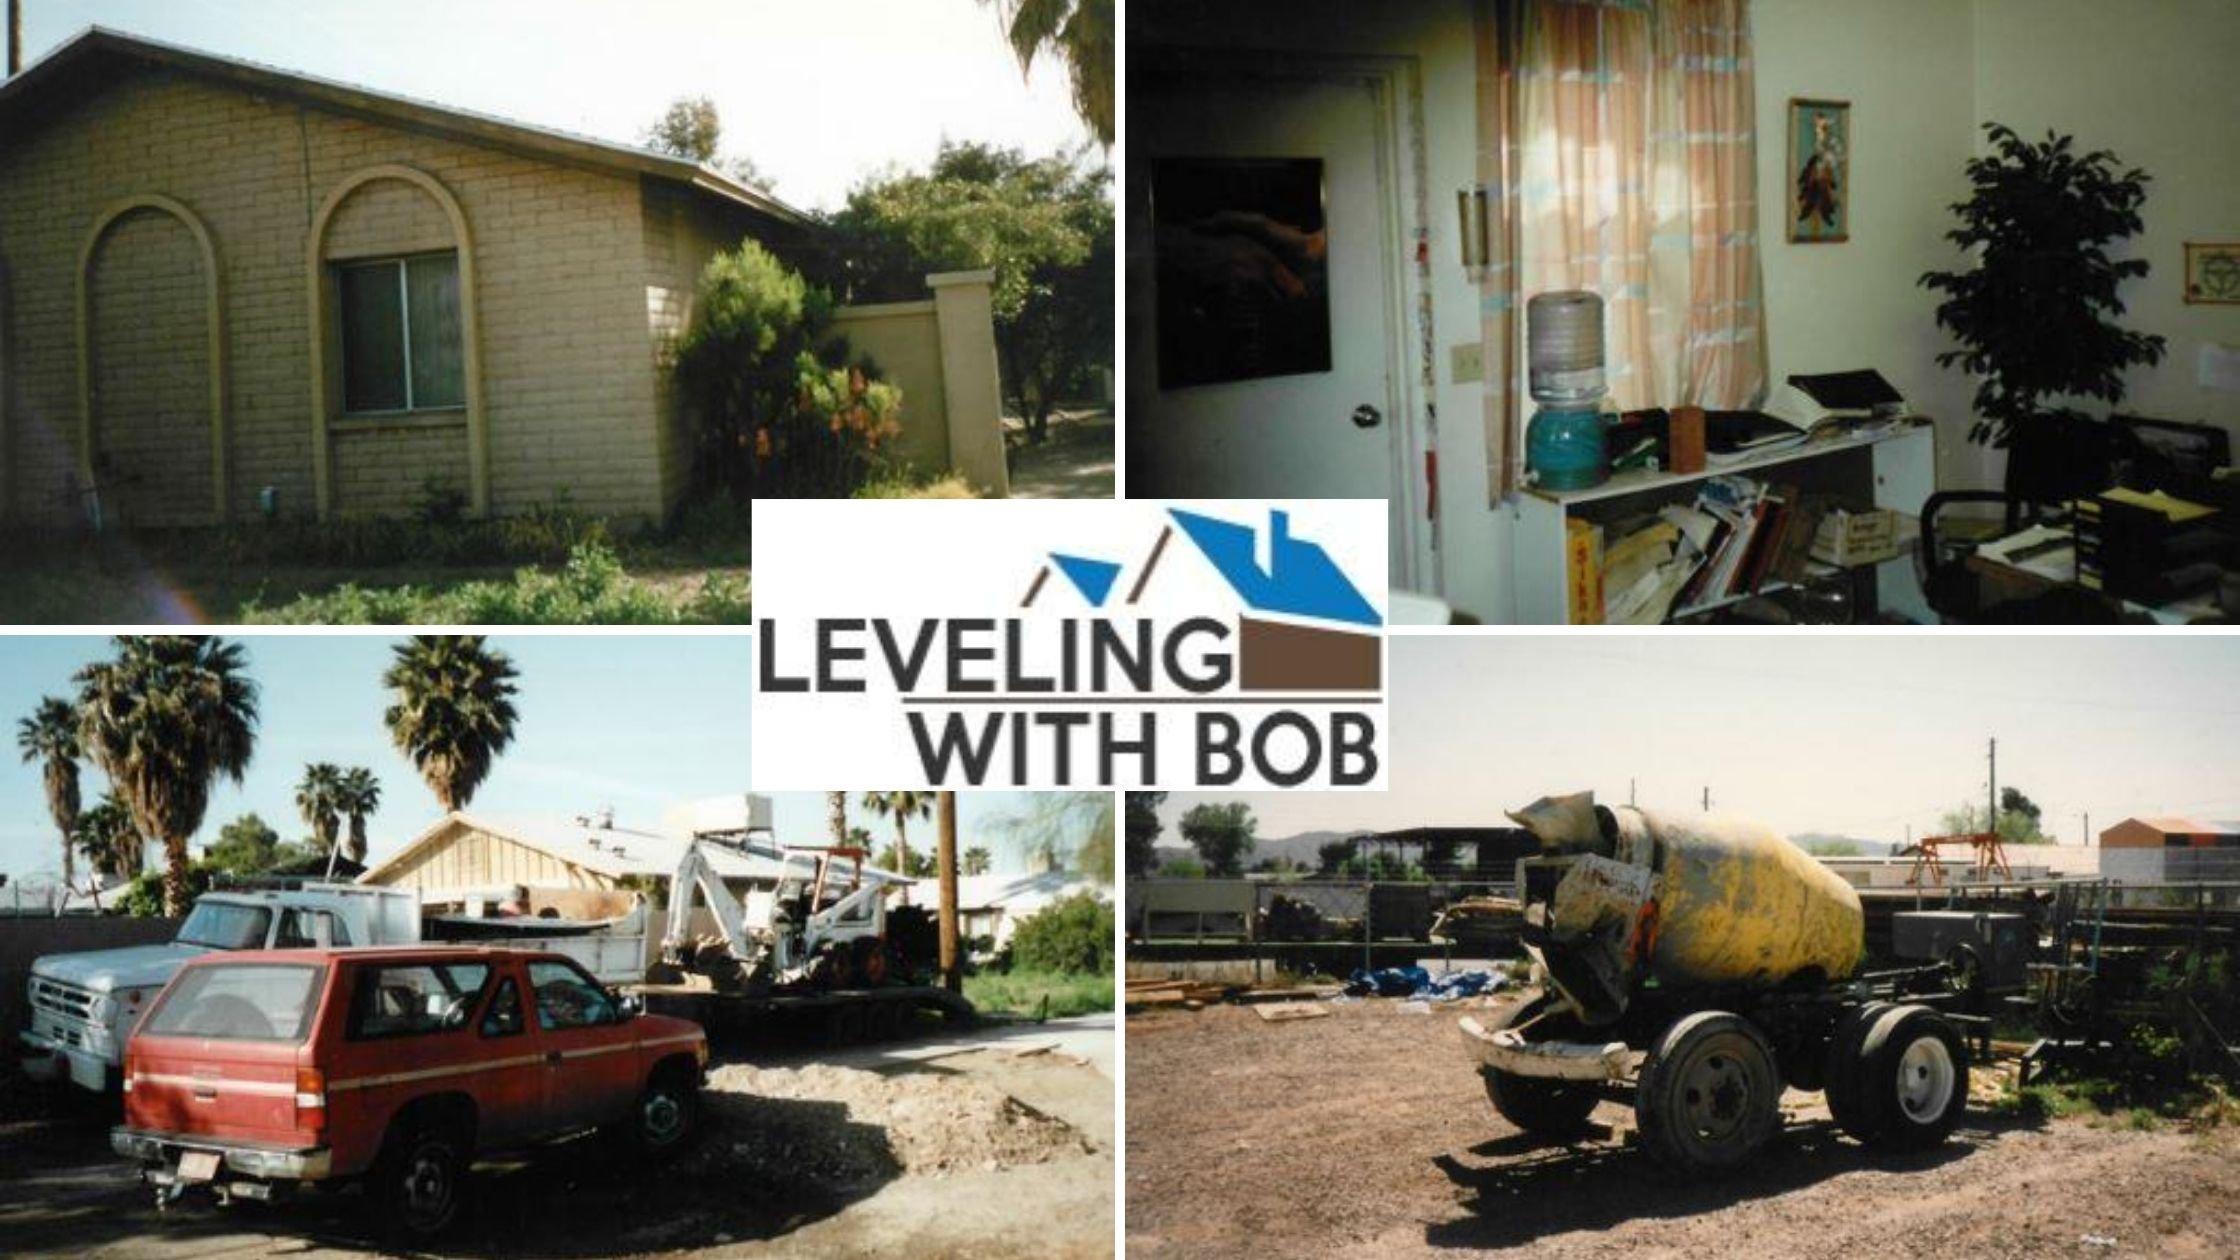 Leveling with Bob Humble Beginnings, Arizona Foundation Solutions